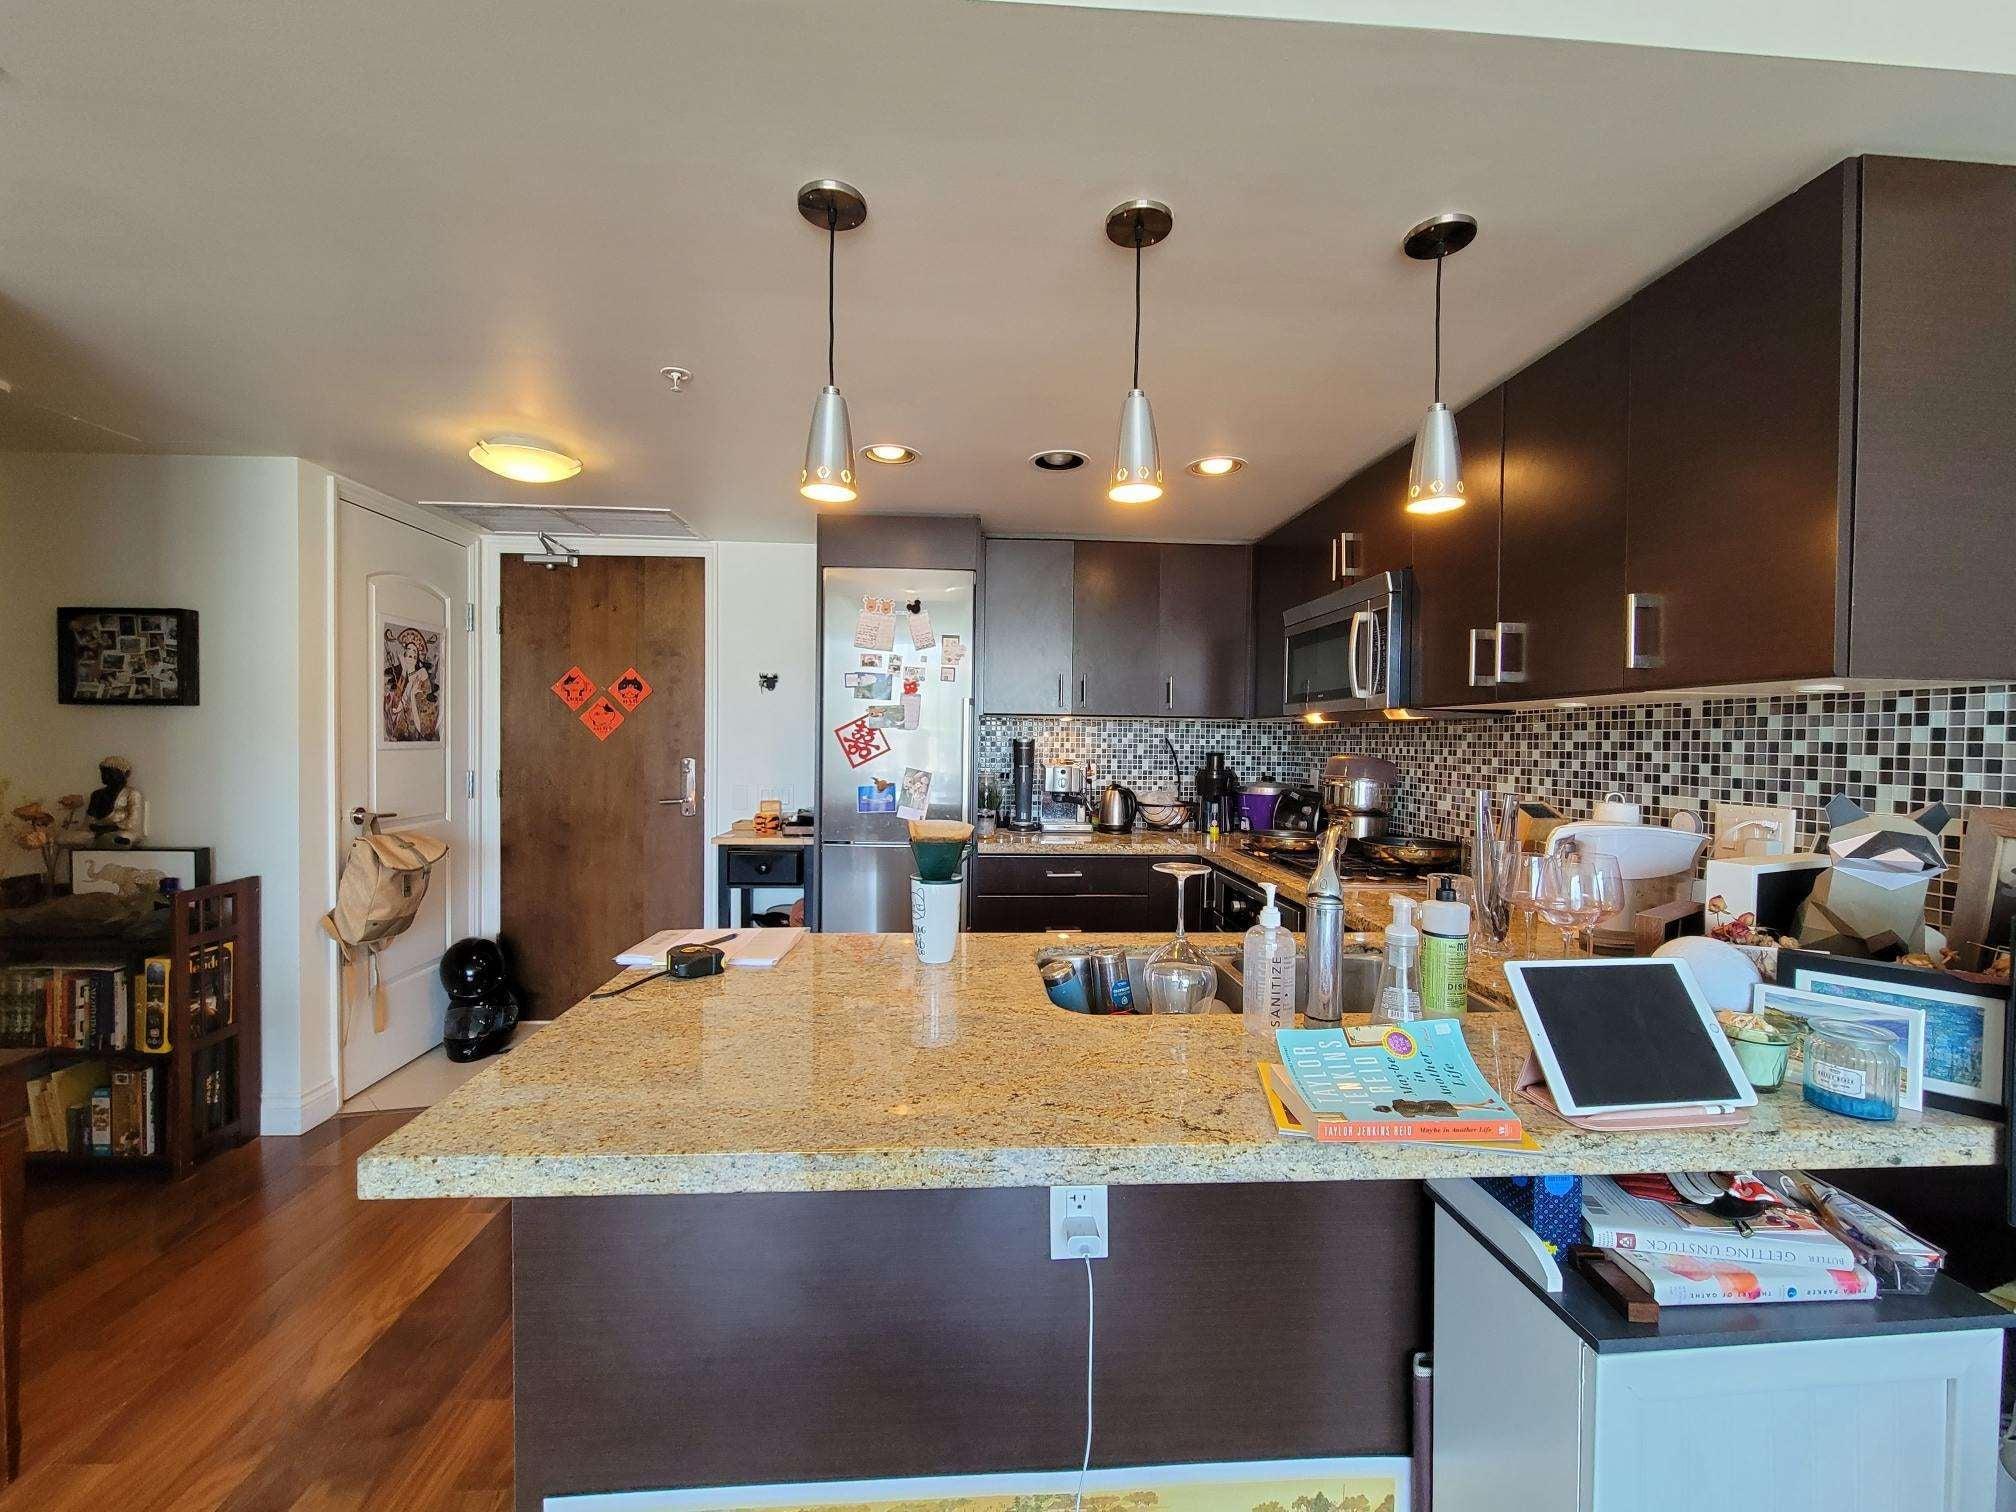 905 133 E ESPLANADE - Lower Lonsdale Apartment/Condo for sale, 1 Bedroom (R2606363) - #1